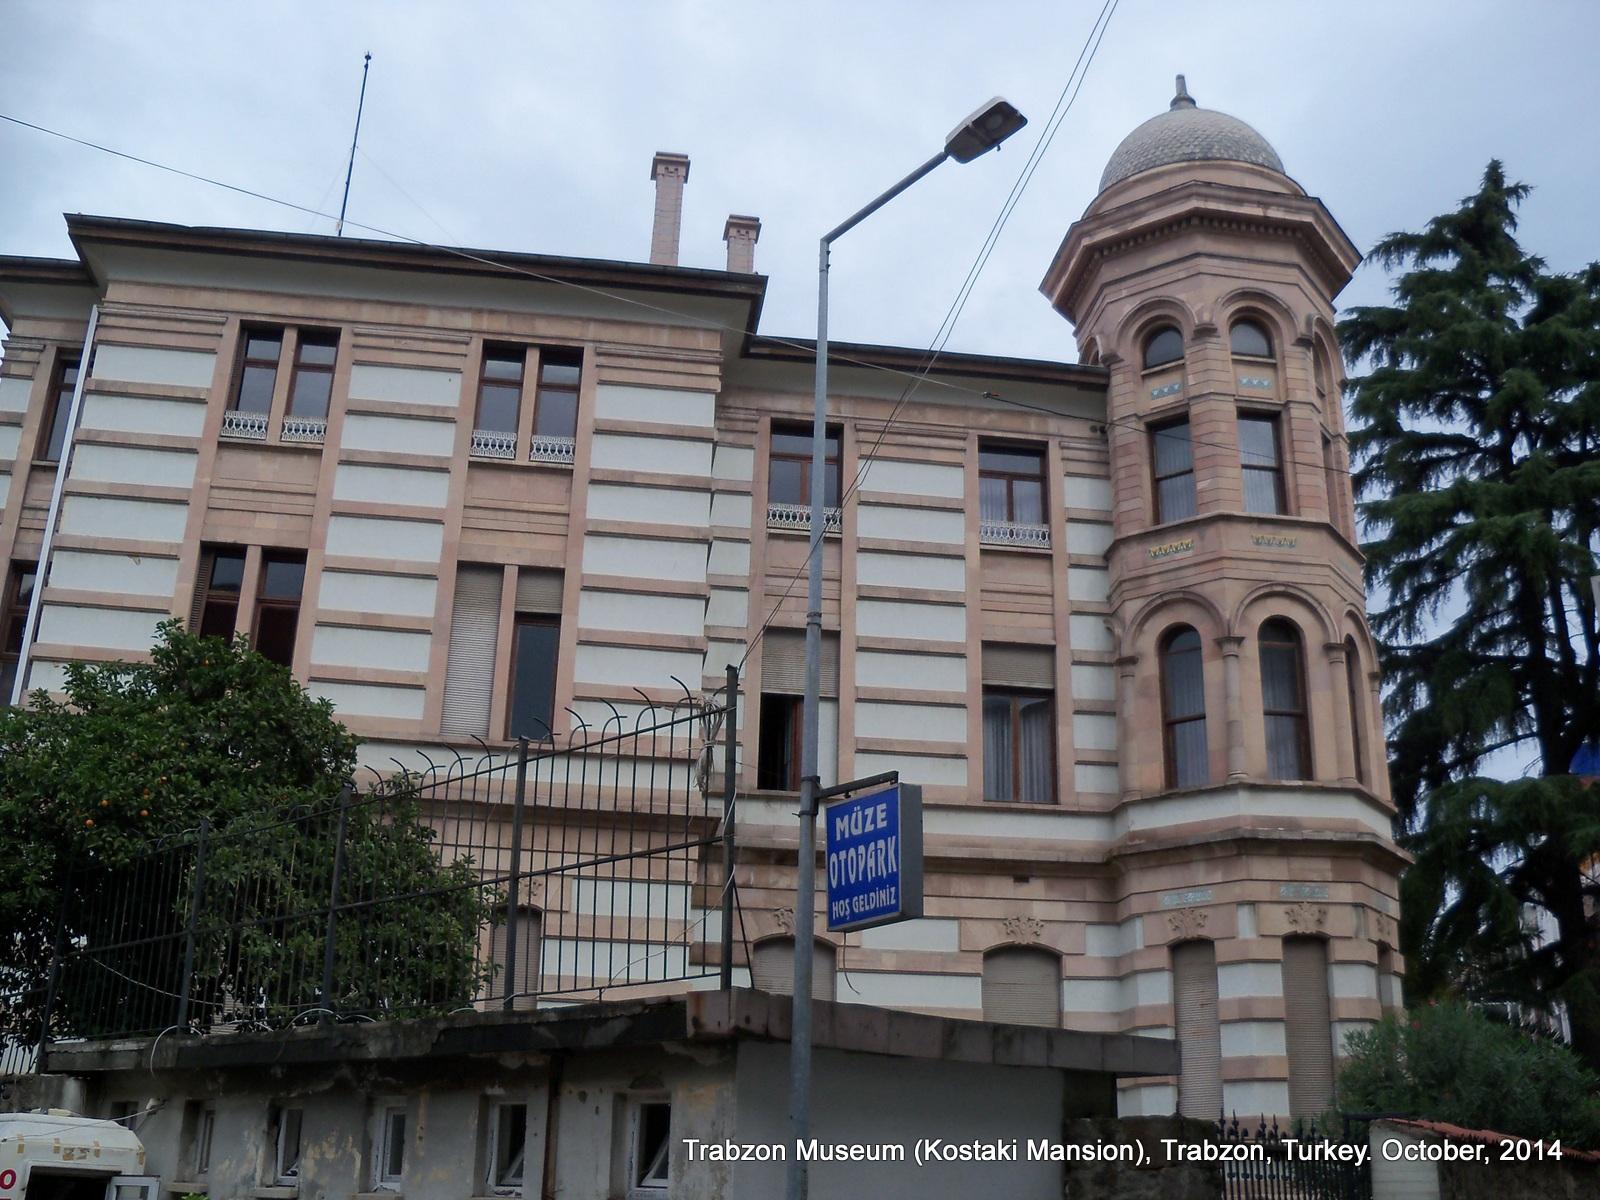 File:Trabzon Museum 2.jpg - Wikimedia Commons